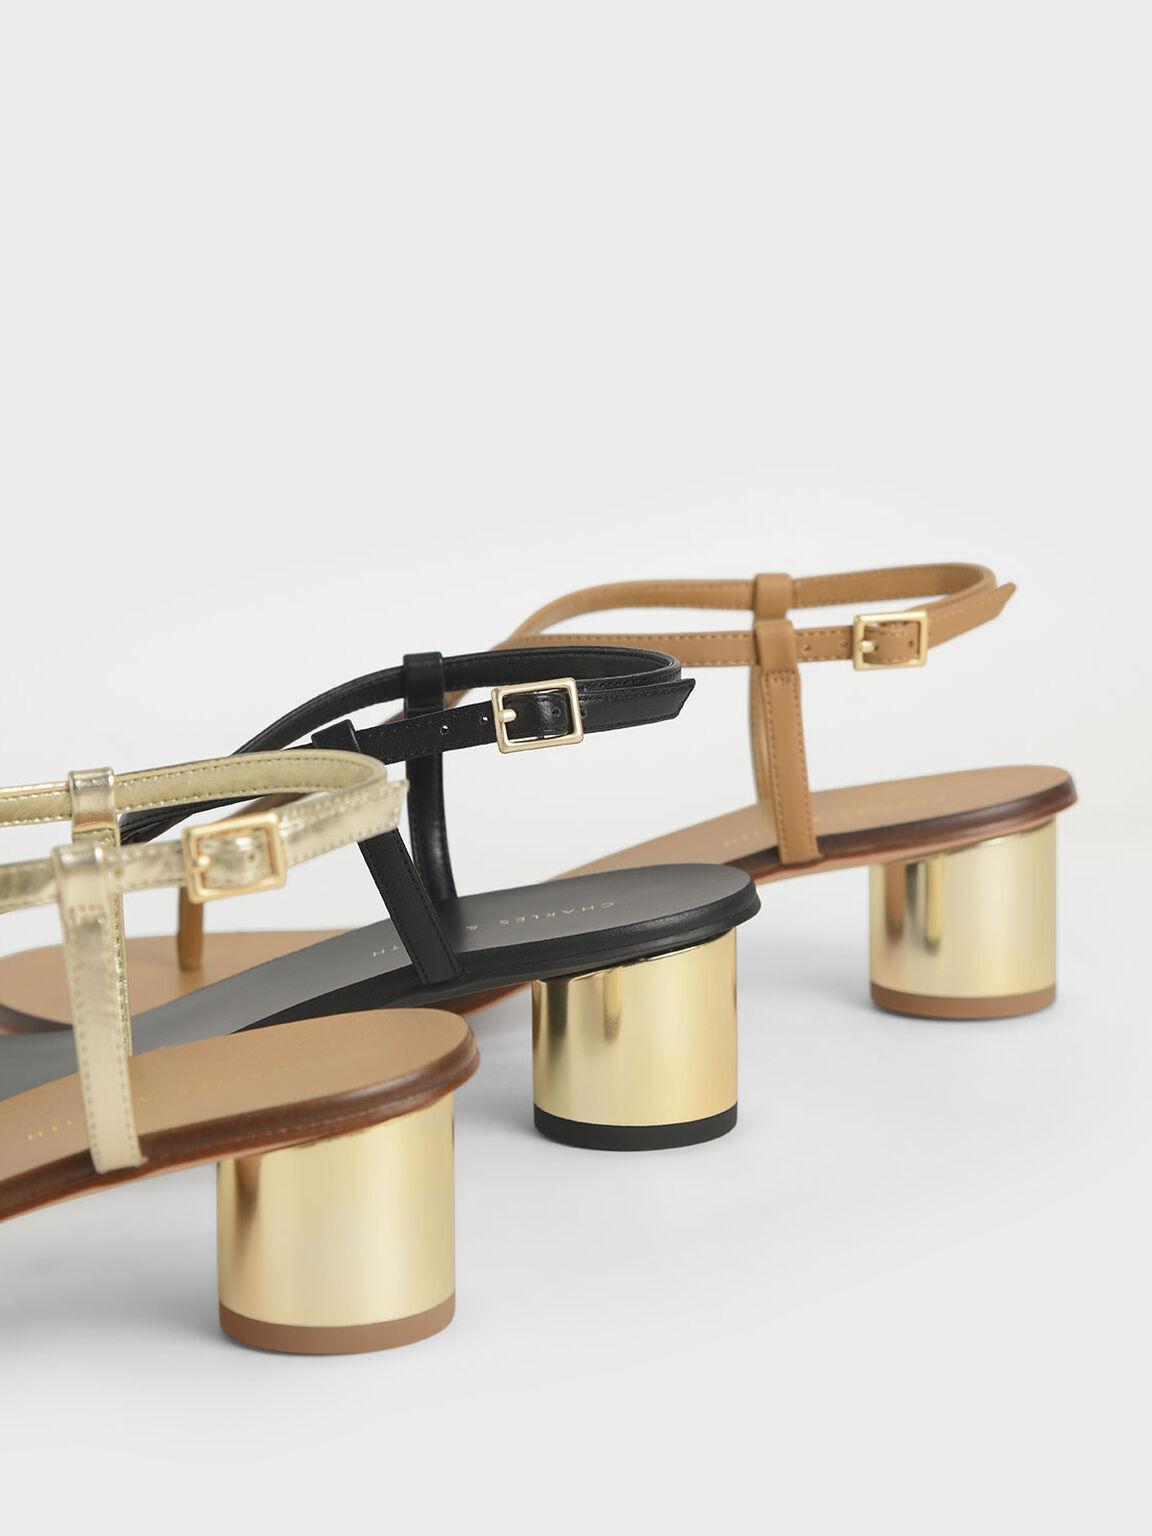 Chrome Heel Thong Sandals, Gold, hi-res